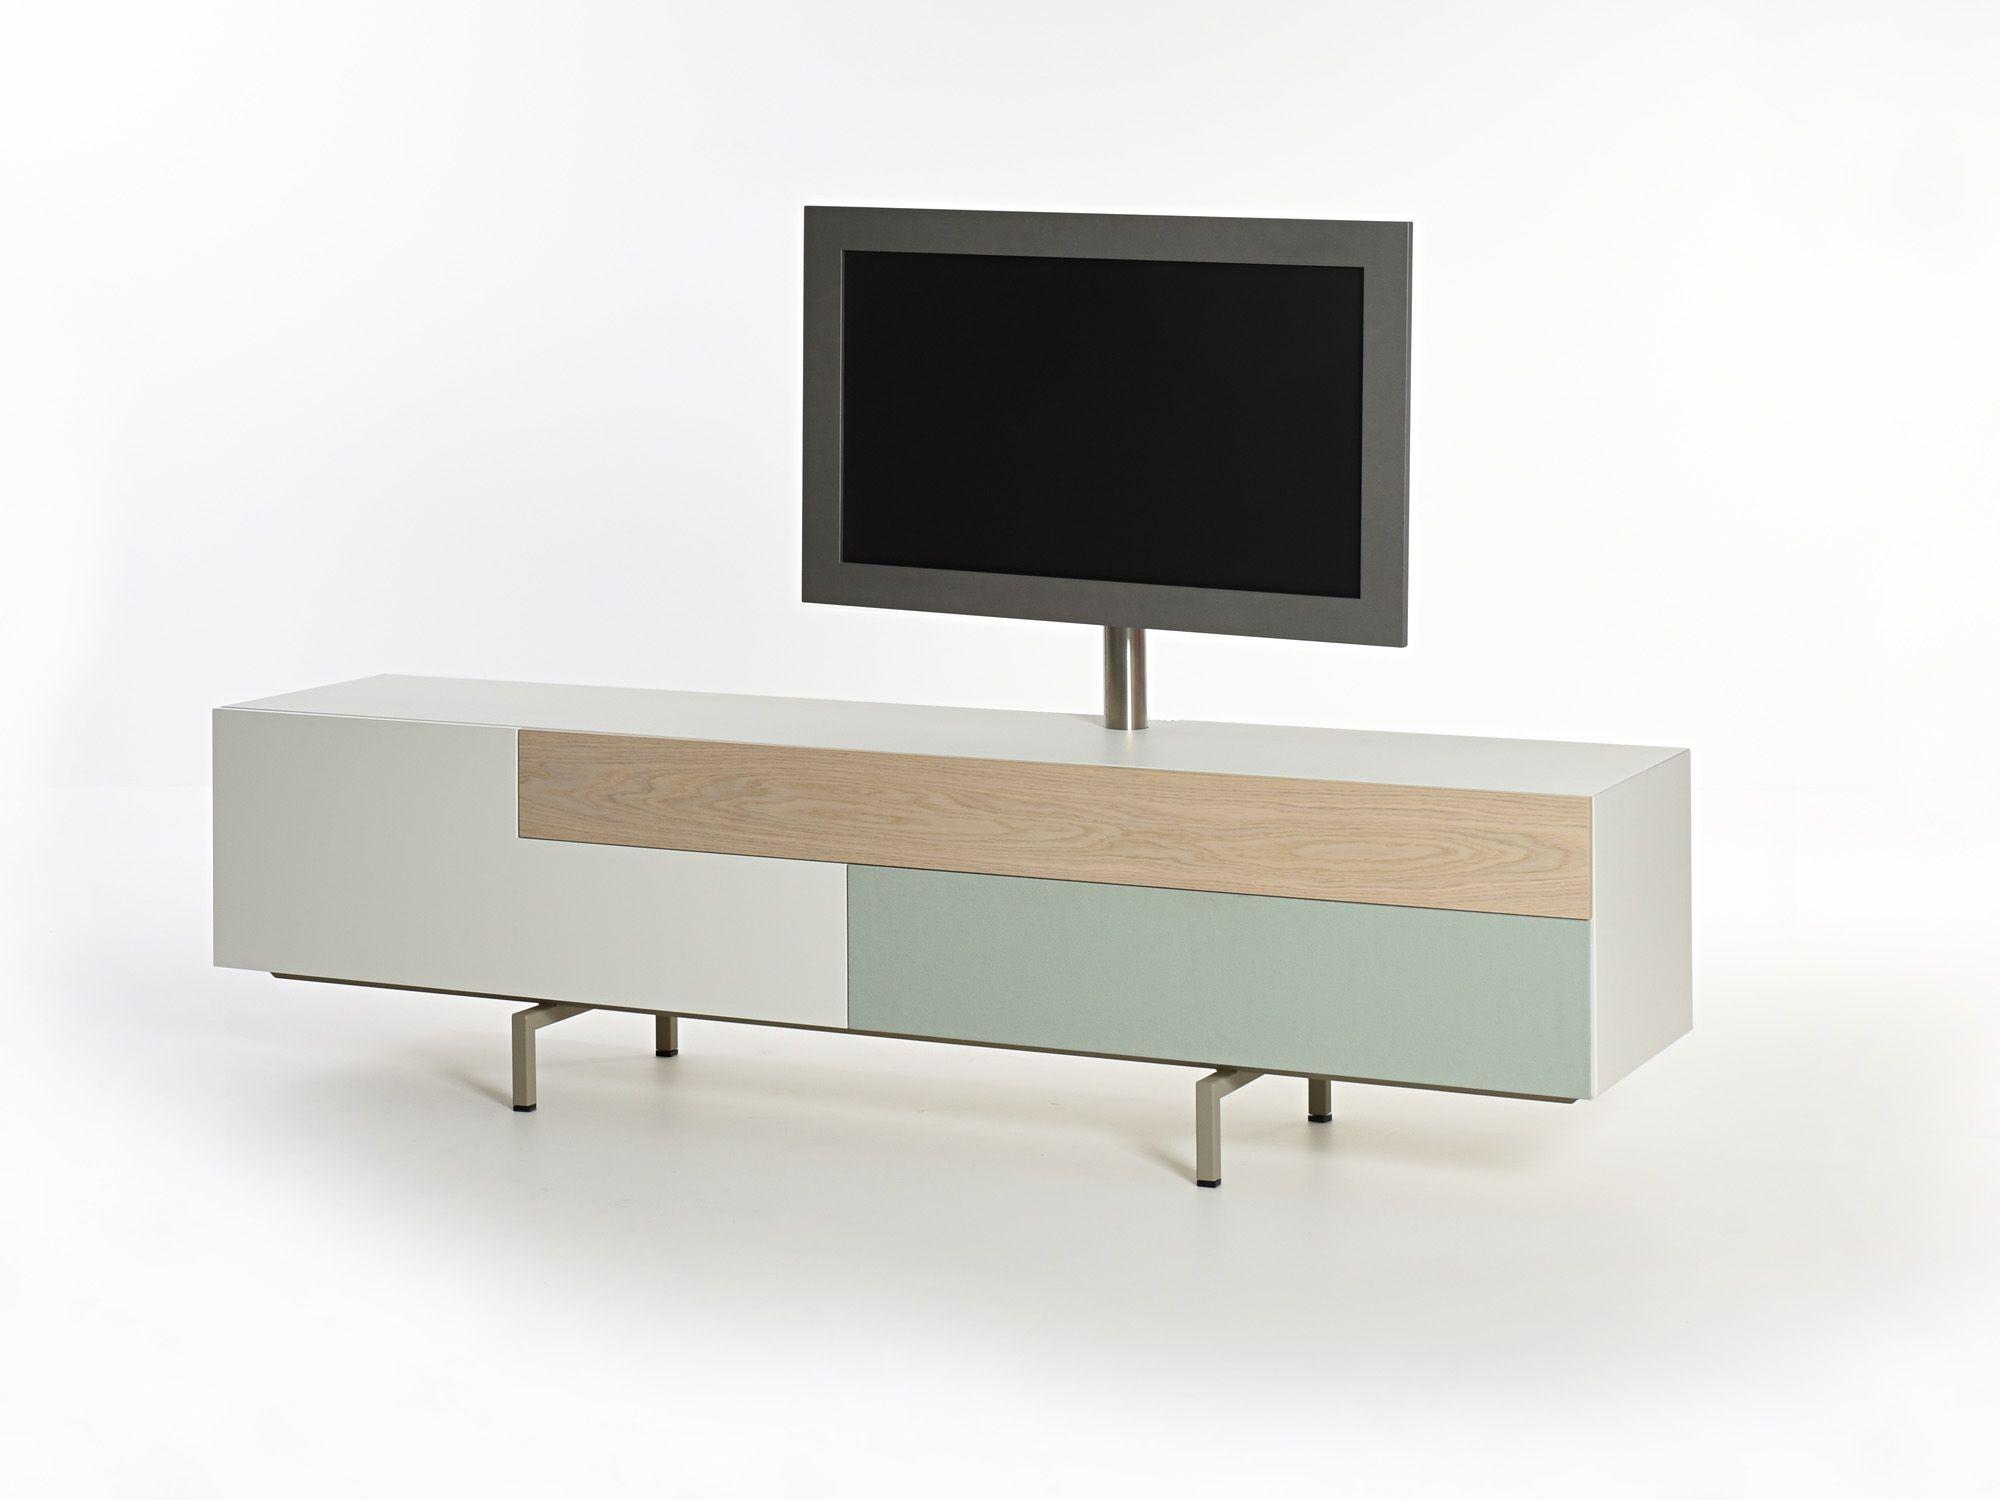 Tv Meubel Castelijn.Castelijn Solo Design By Castelijn Team Interieur Meubels Tv